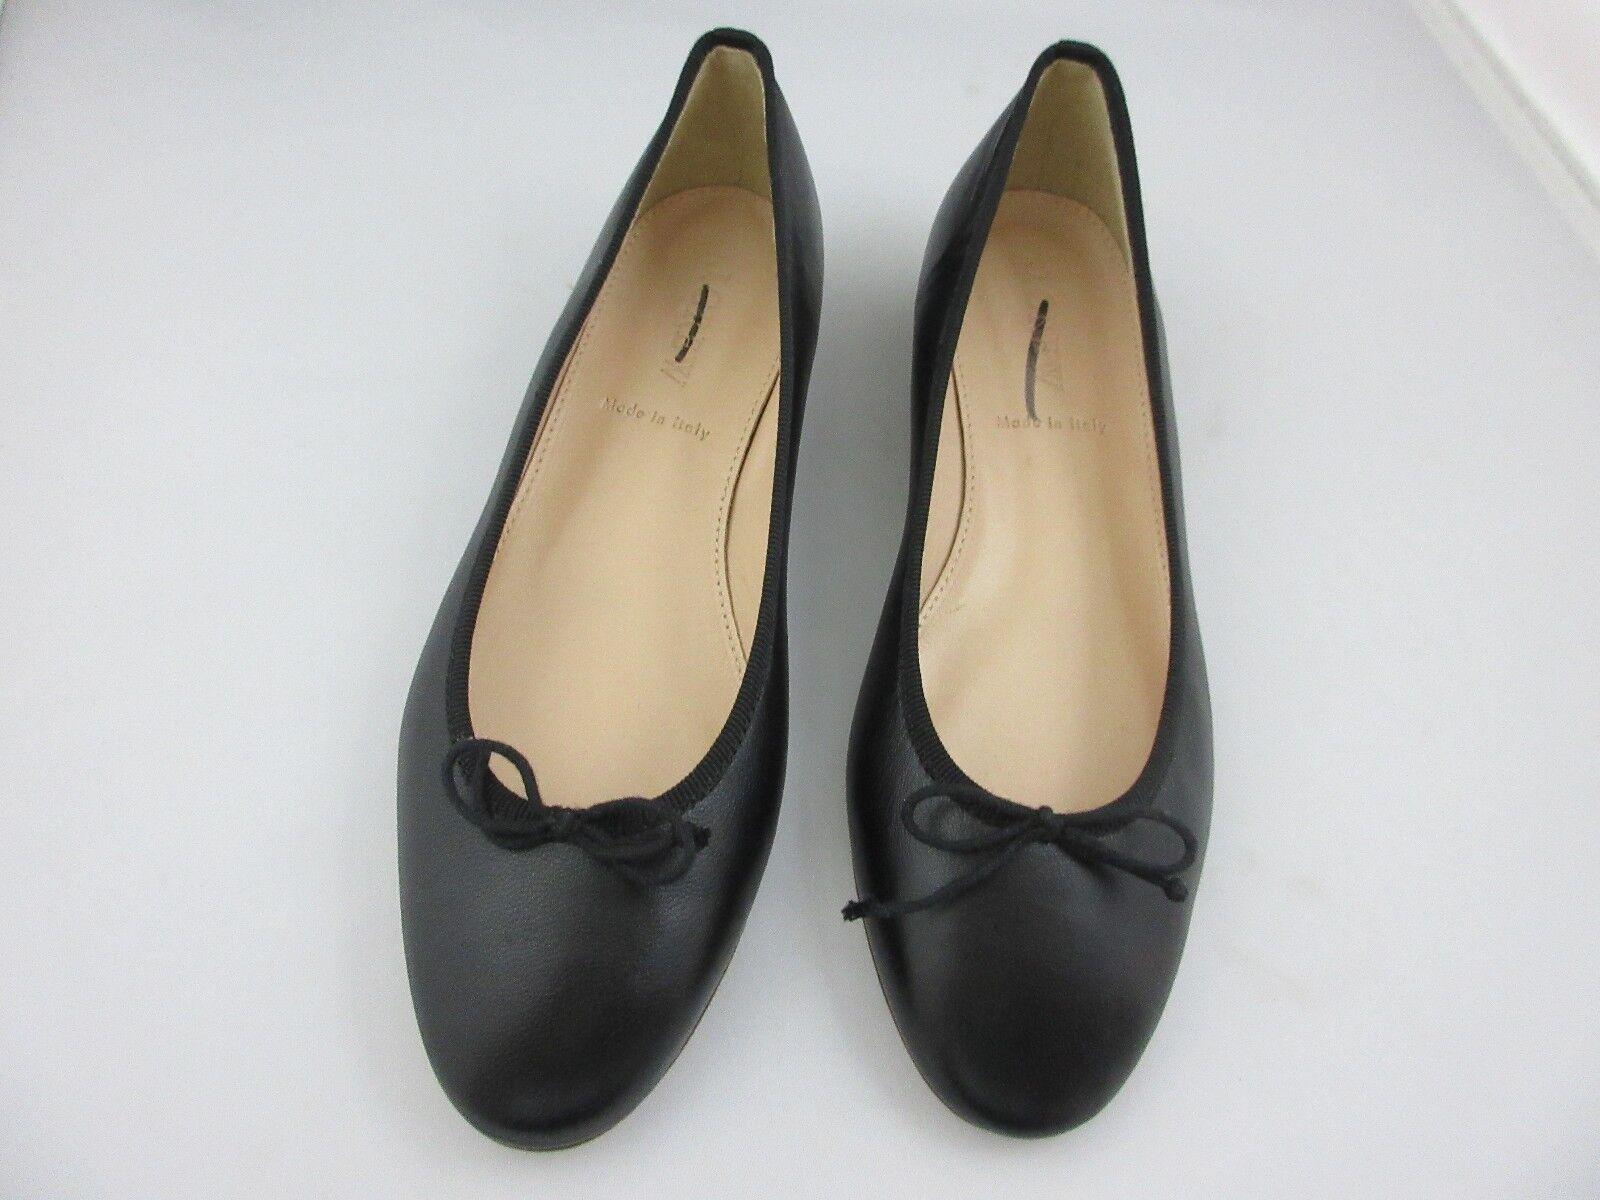 J. Crew Kiki Ballet Flats Flats Flats Shoes Black Italian Leather Women's Sz 5.5 Style F5510 751e4c